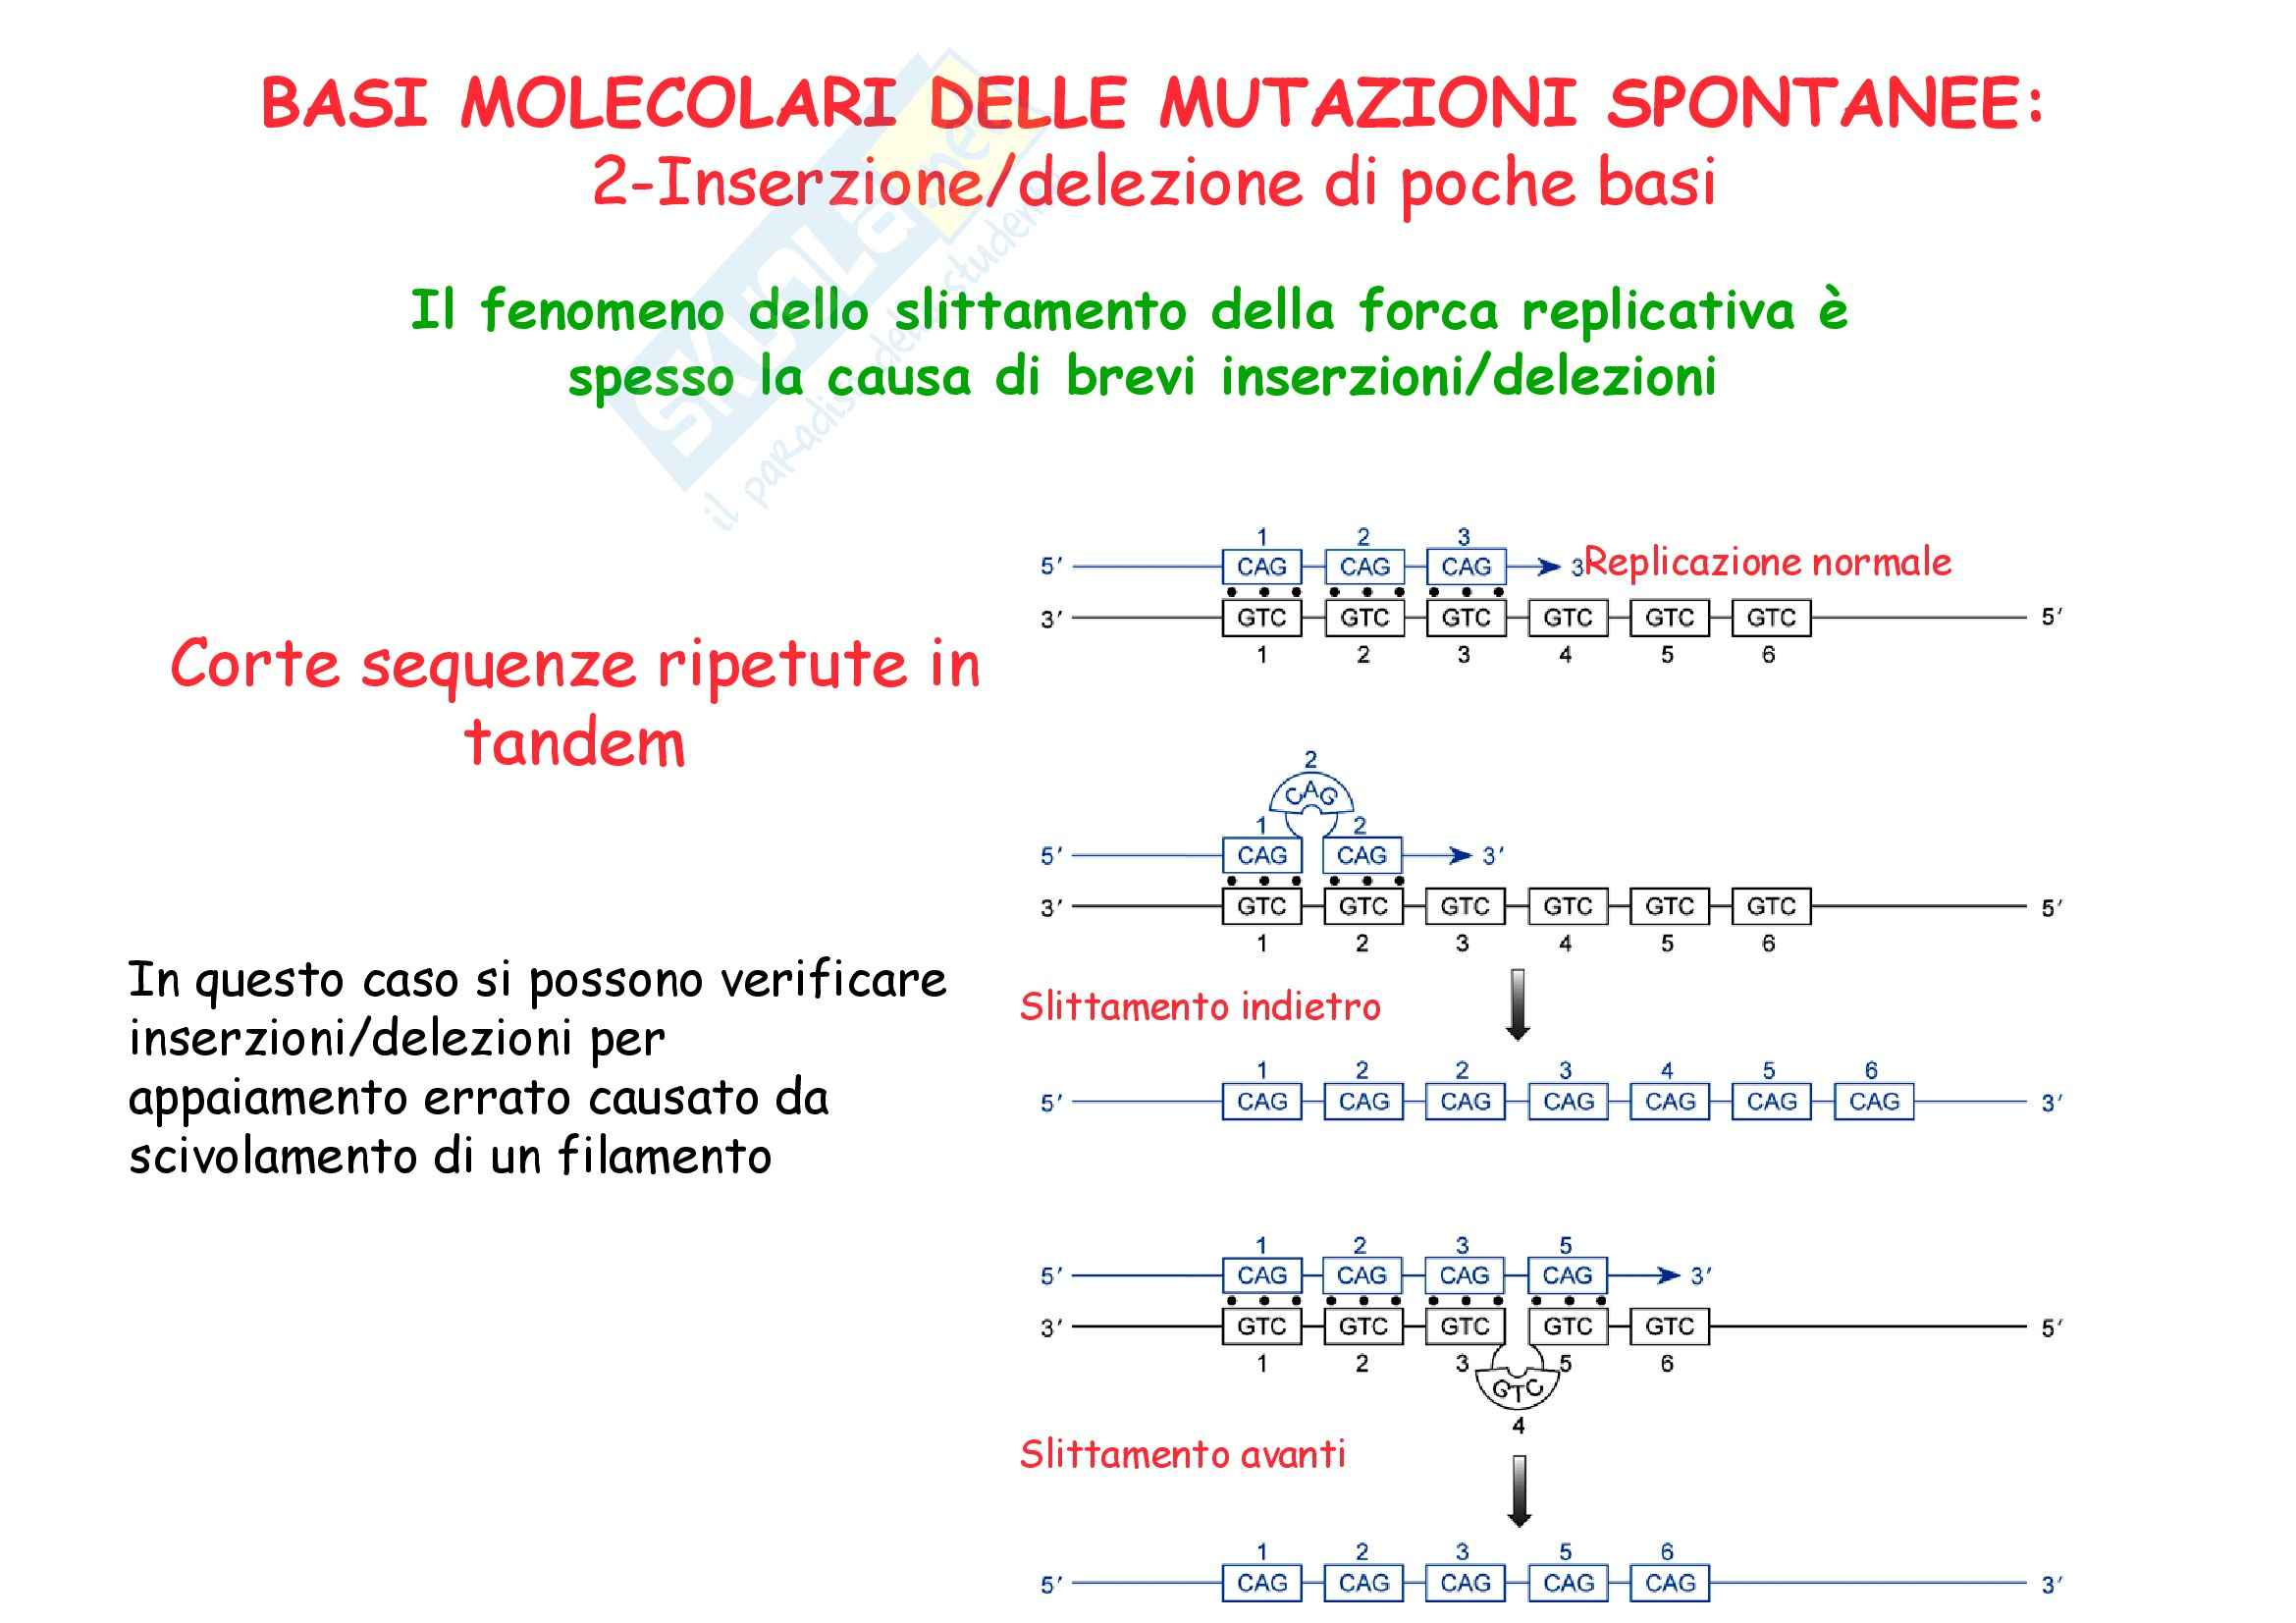 Genetica umana - alleli e Mendel - Appunti Pag. 16